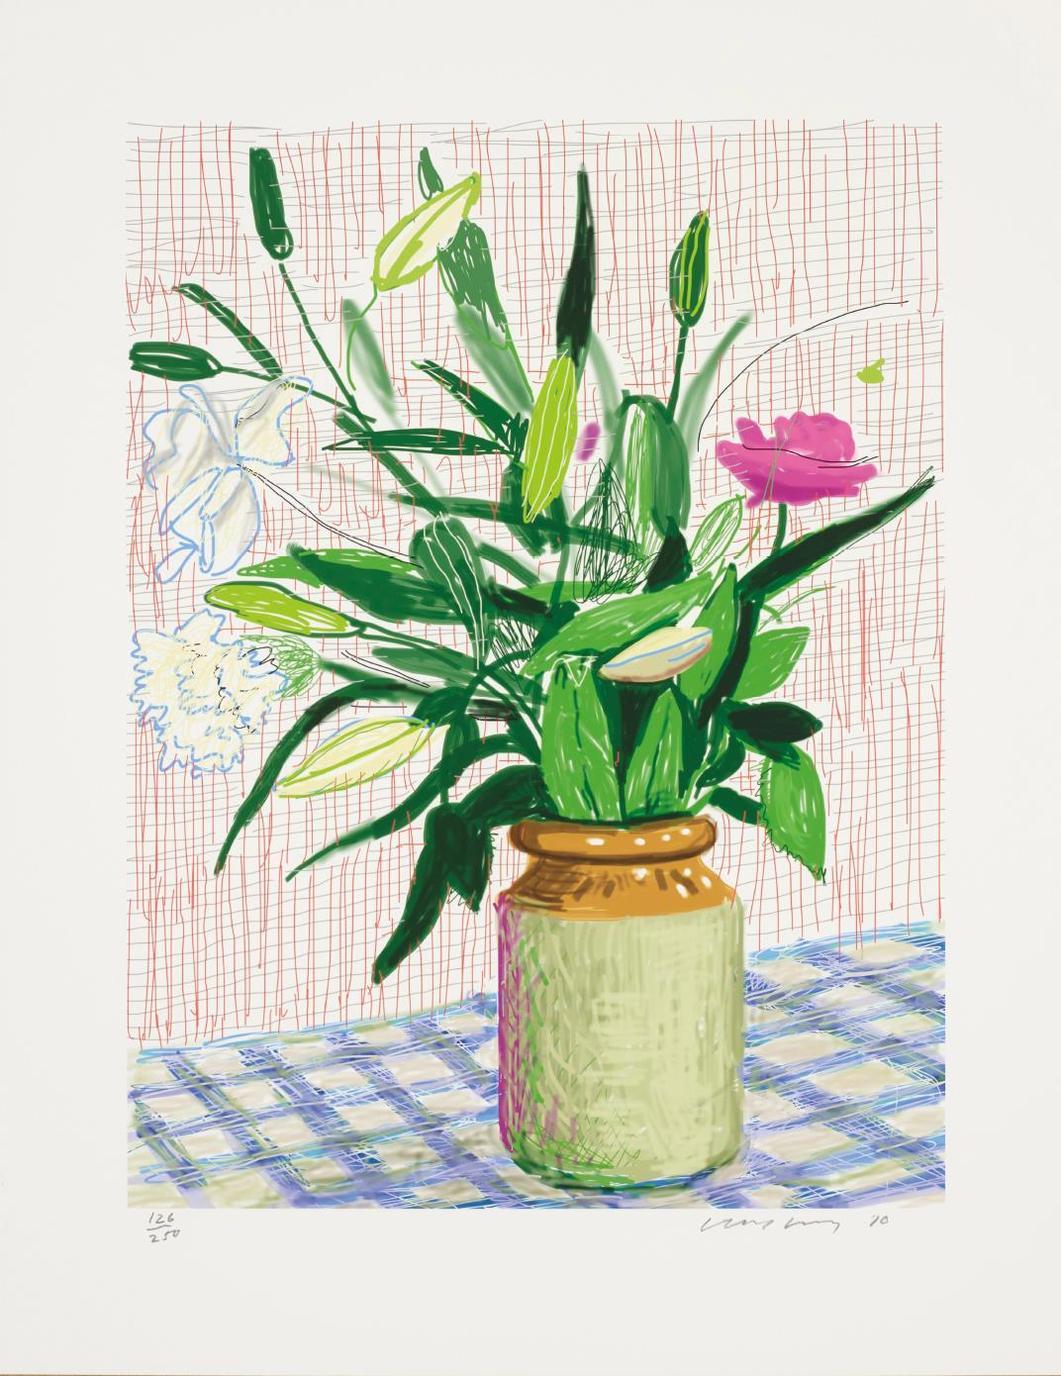 David Hockney-Untitled No. 516, From A Bigger Book: Art Edition D-2016